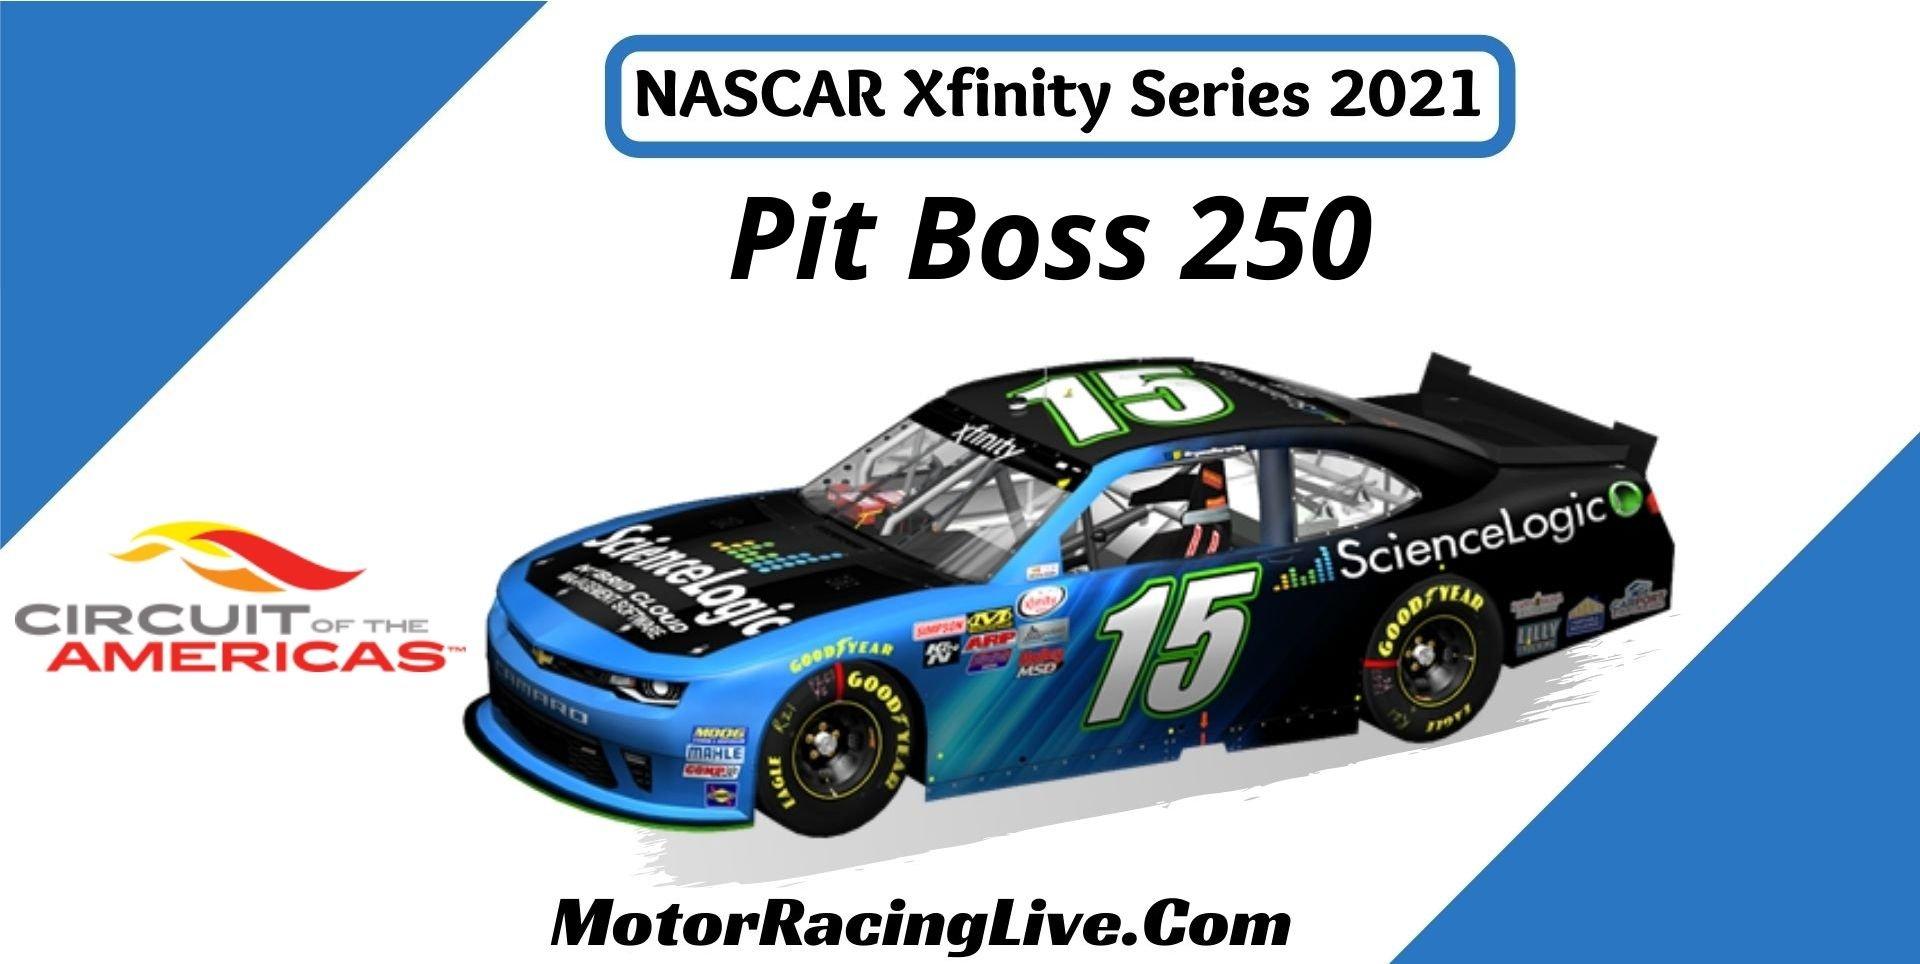 Pit Boss 250 Nascar Xfinity Series 2021 Live Stream